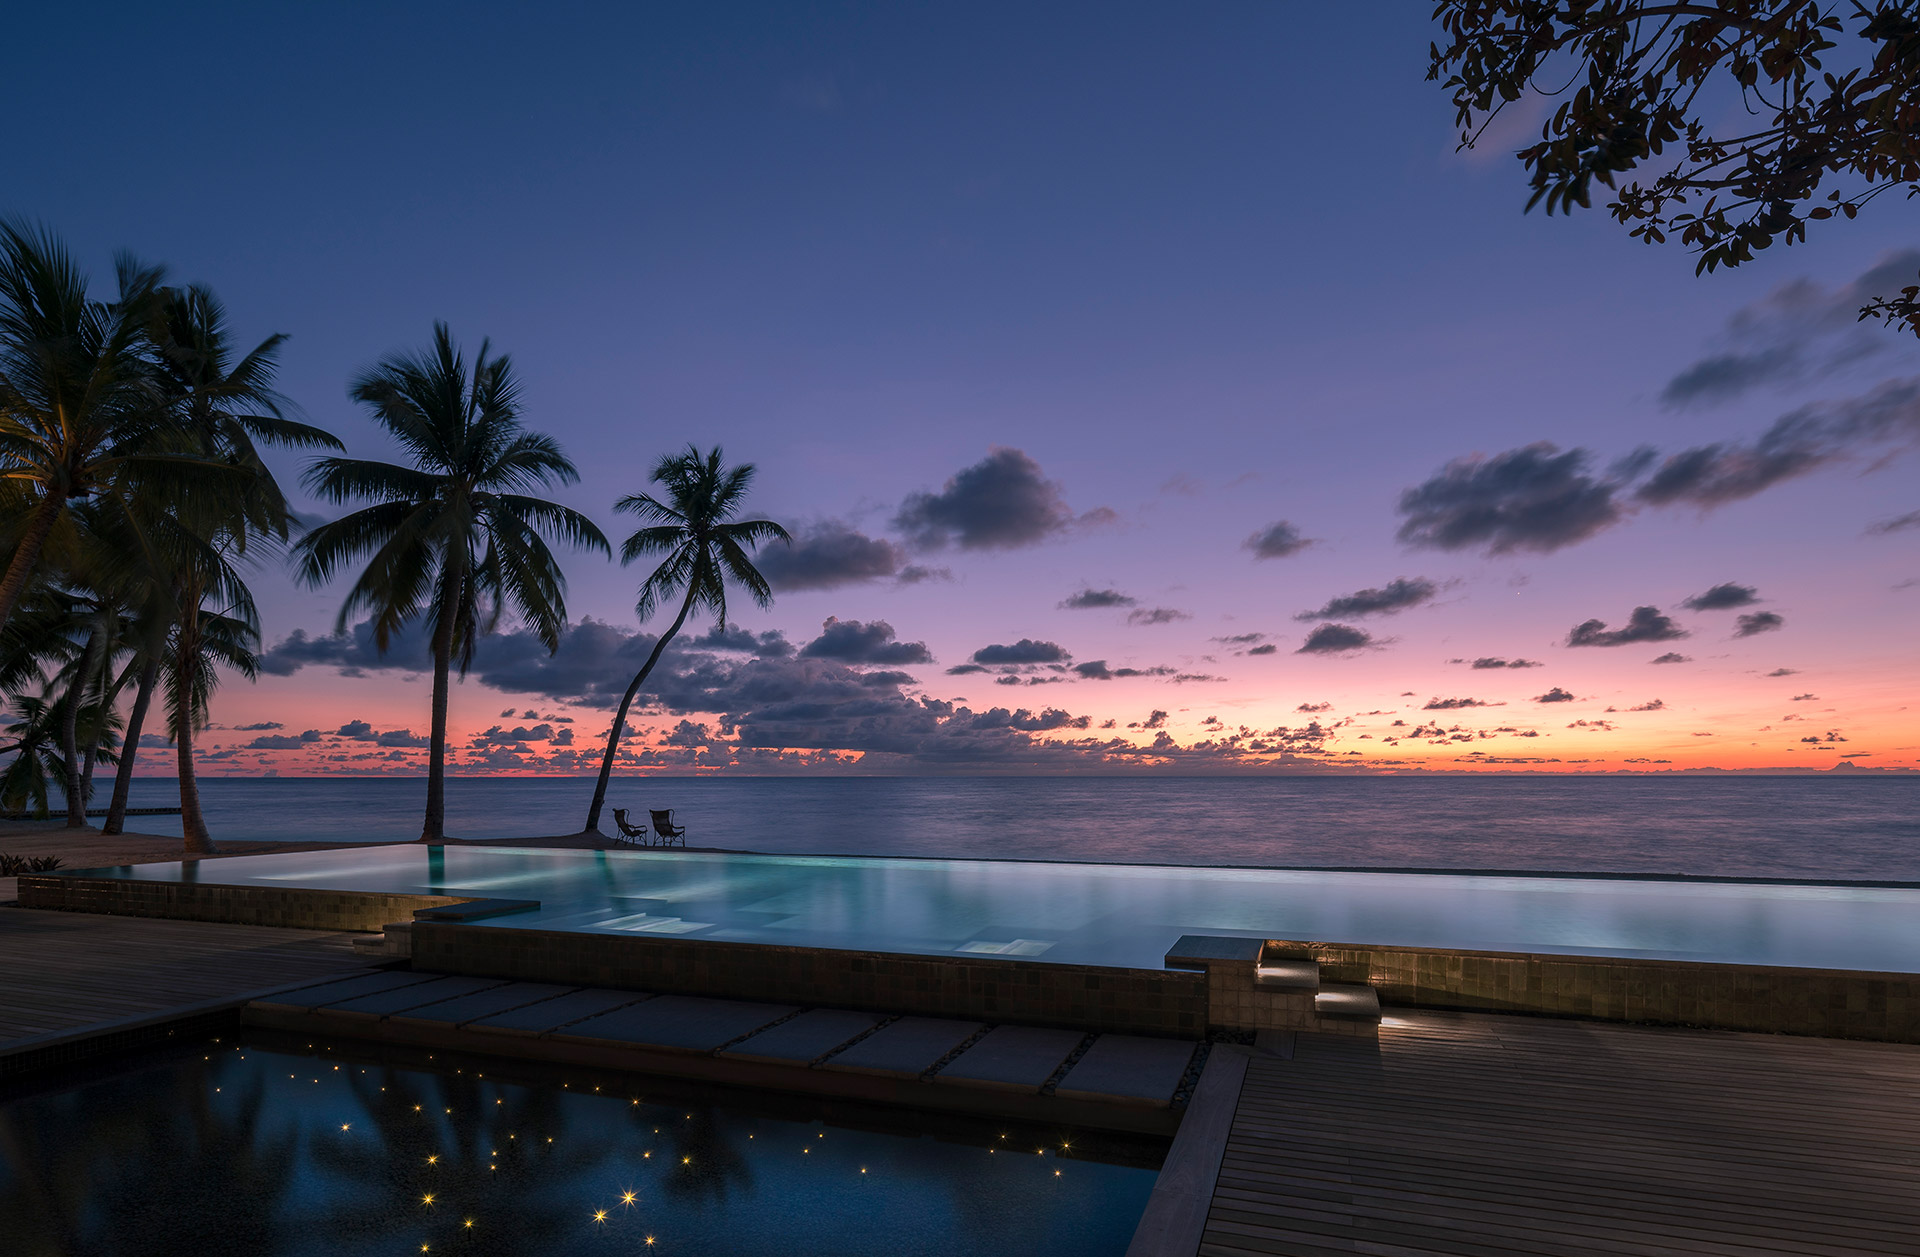 Pool-Four Seasons Desroches Island